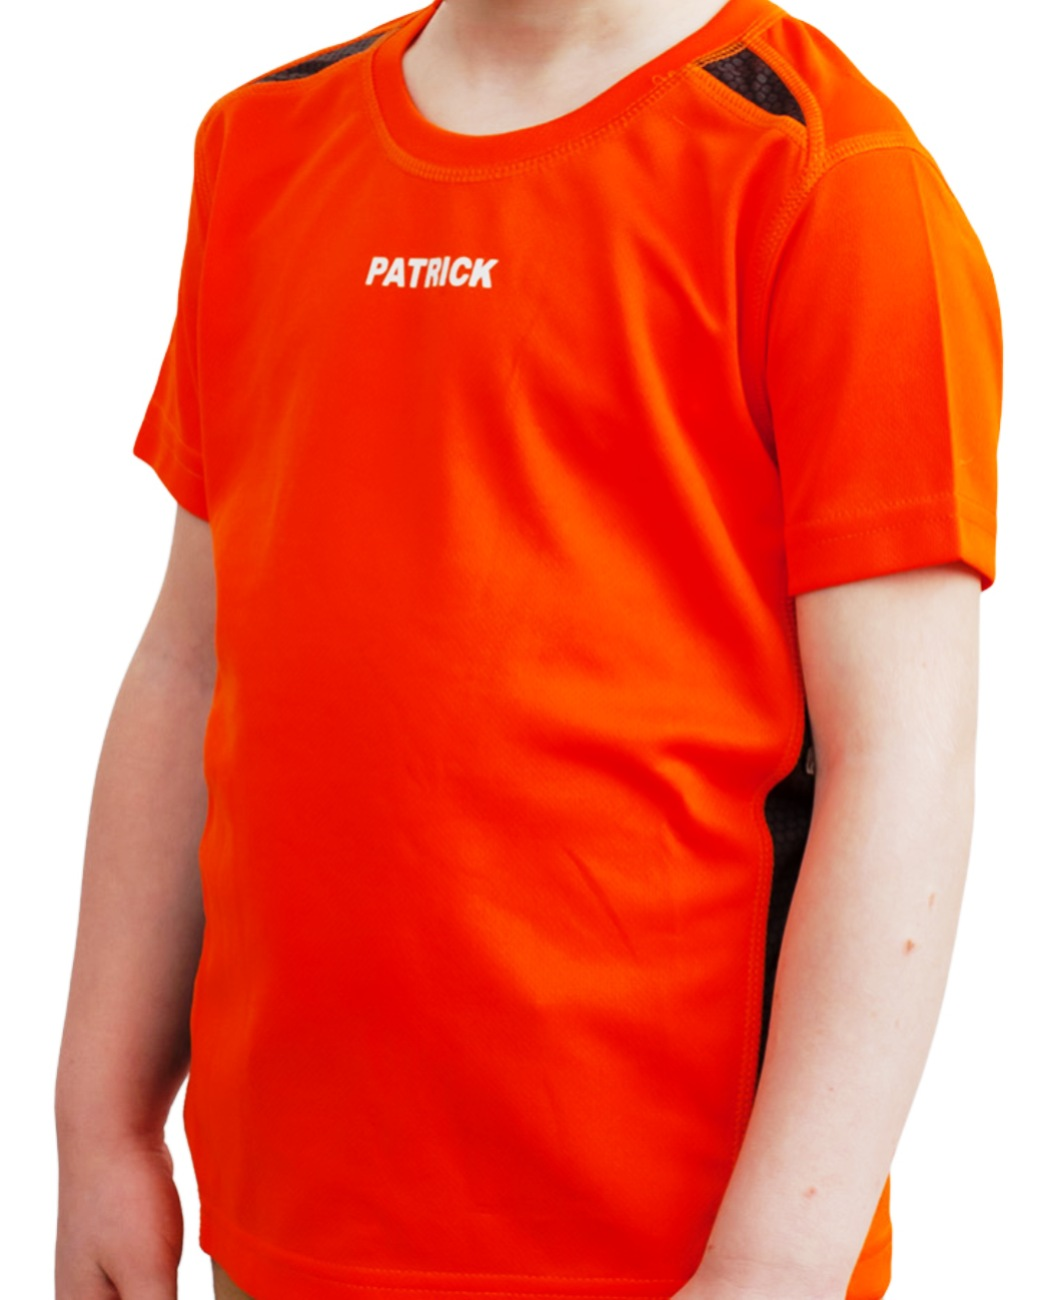 Оранжевая футболка (Patrick, Бельгия) №N563